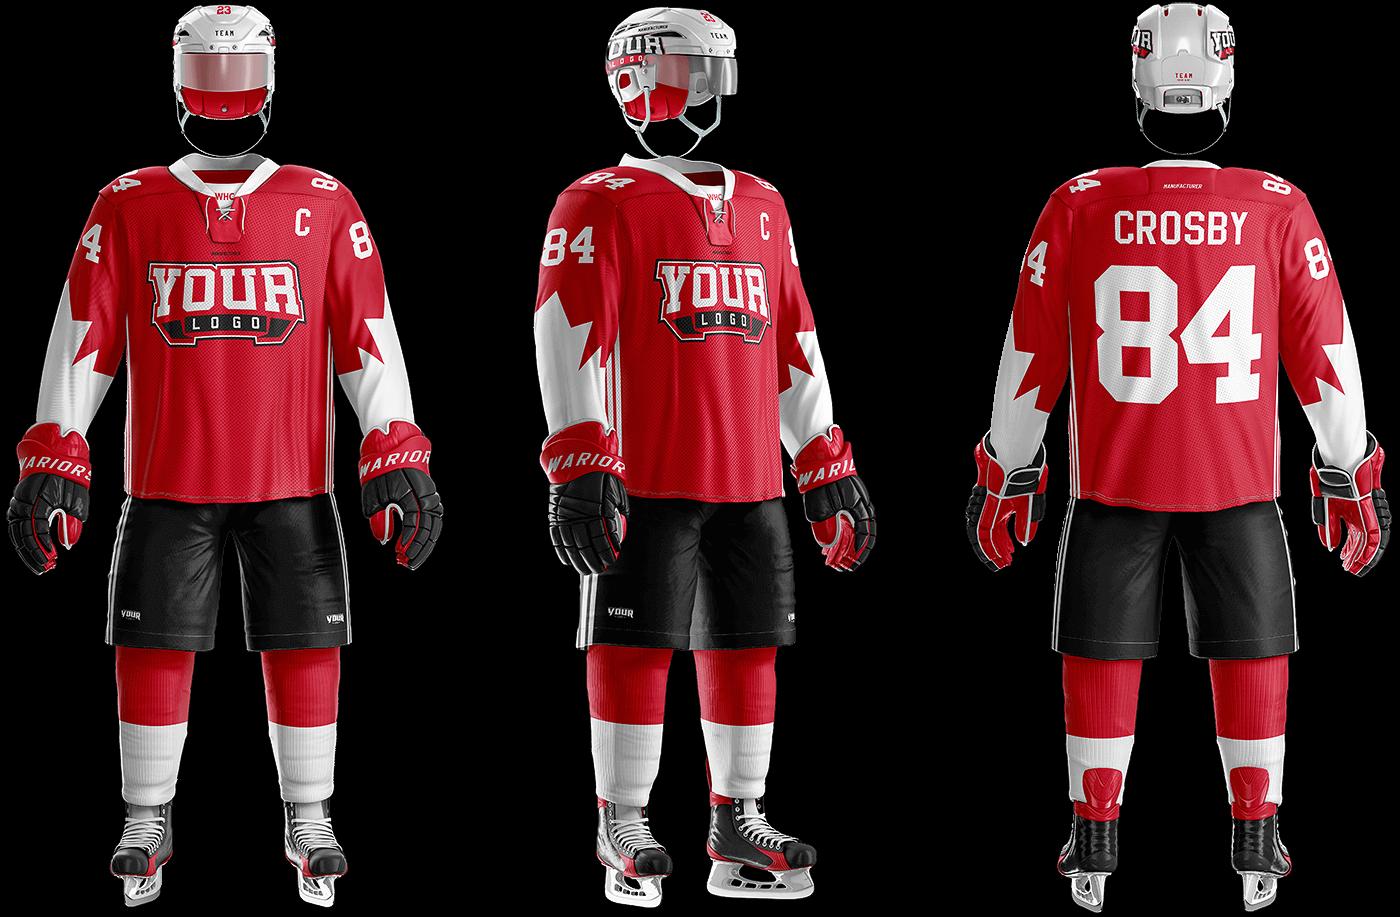 b01c06da2 Ice Hockey Uniform Template – Sports Templates